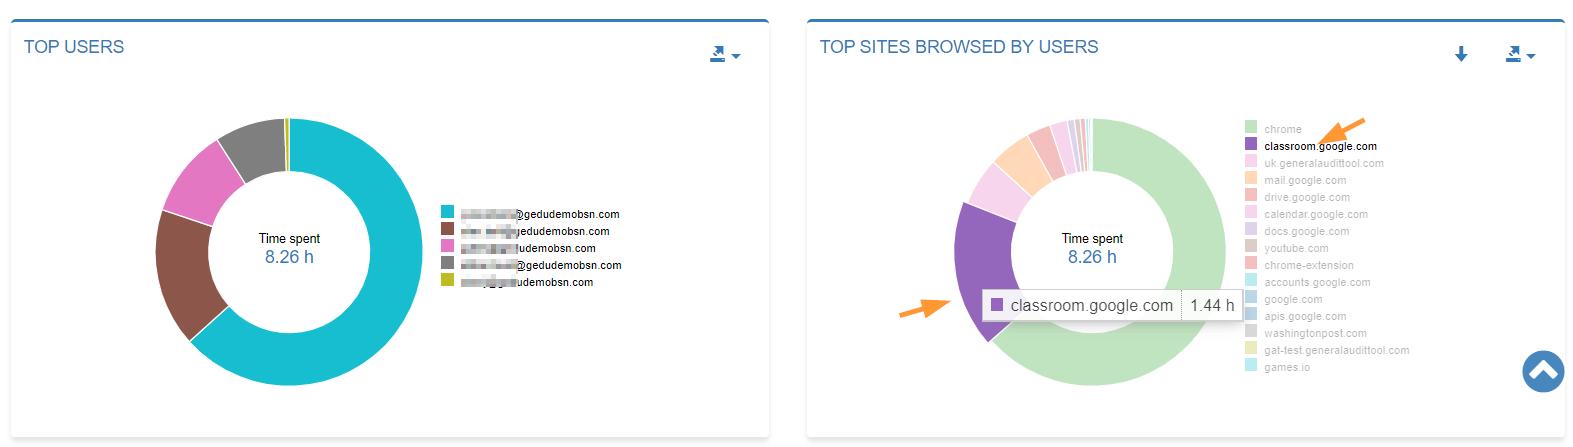 GAT Shield | Monitor Google Classroom Browsing Activity 4